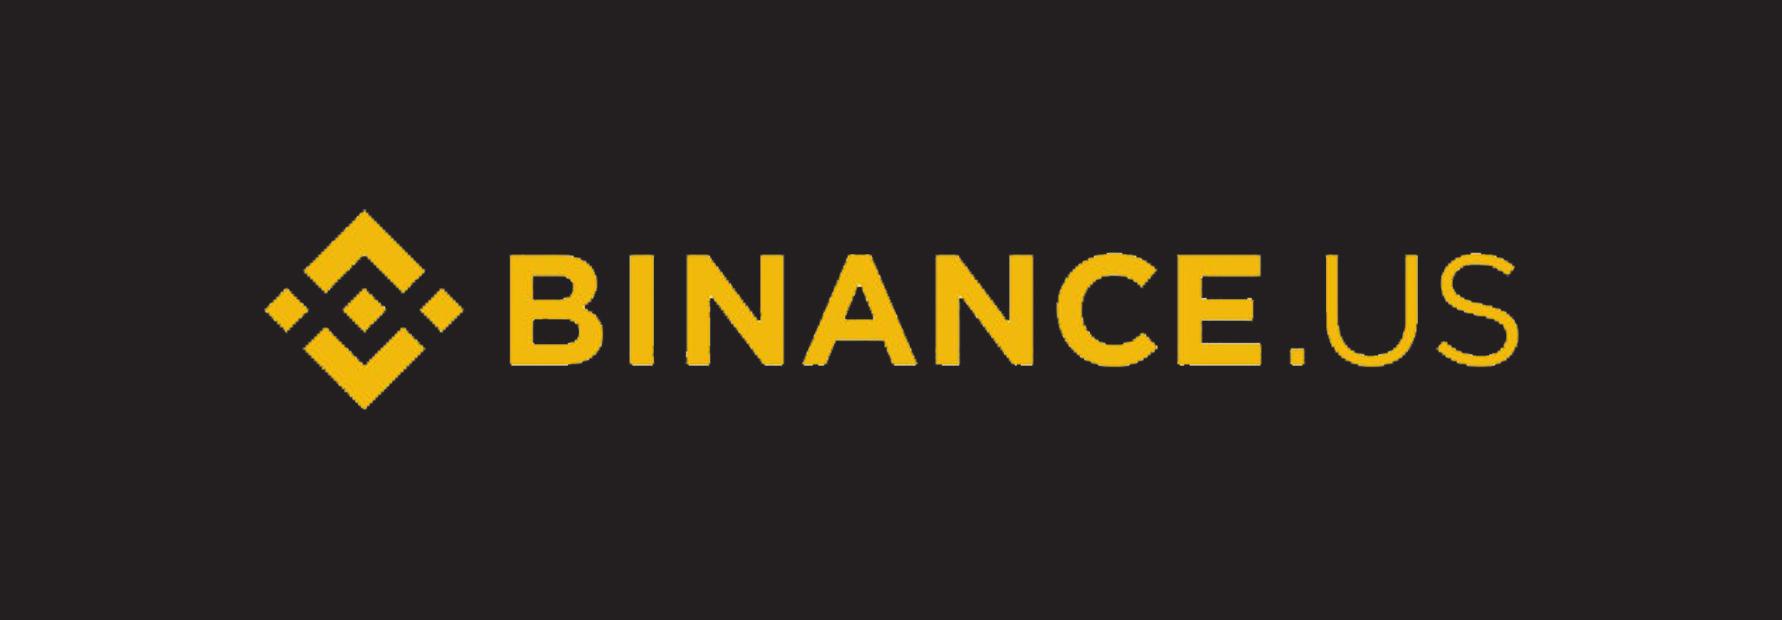 Binance US